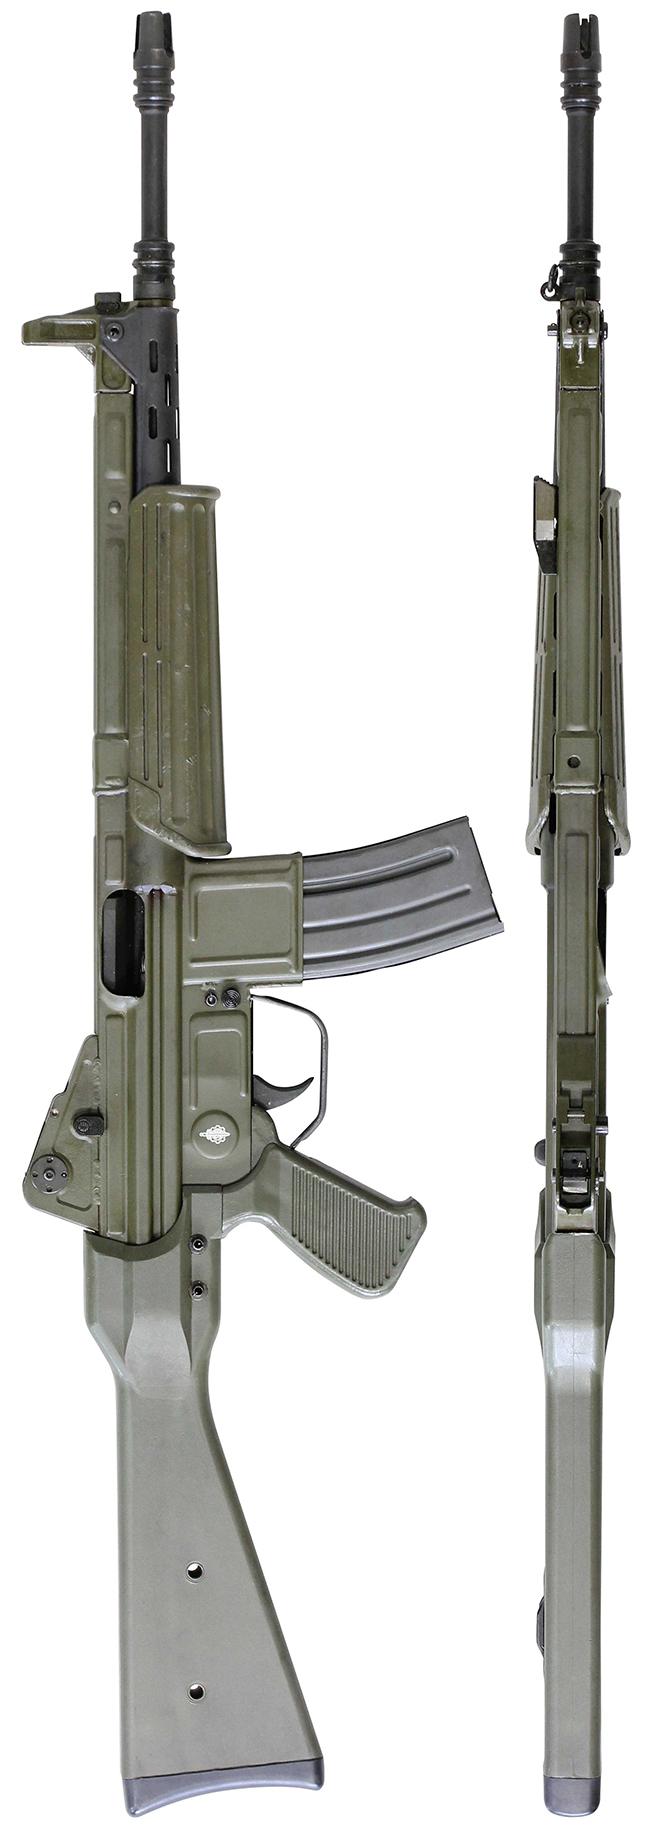 【HP無】セトメ-モデロL-自動小銃-(#L-112880)右.jpg